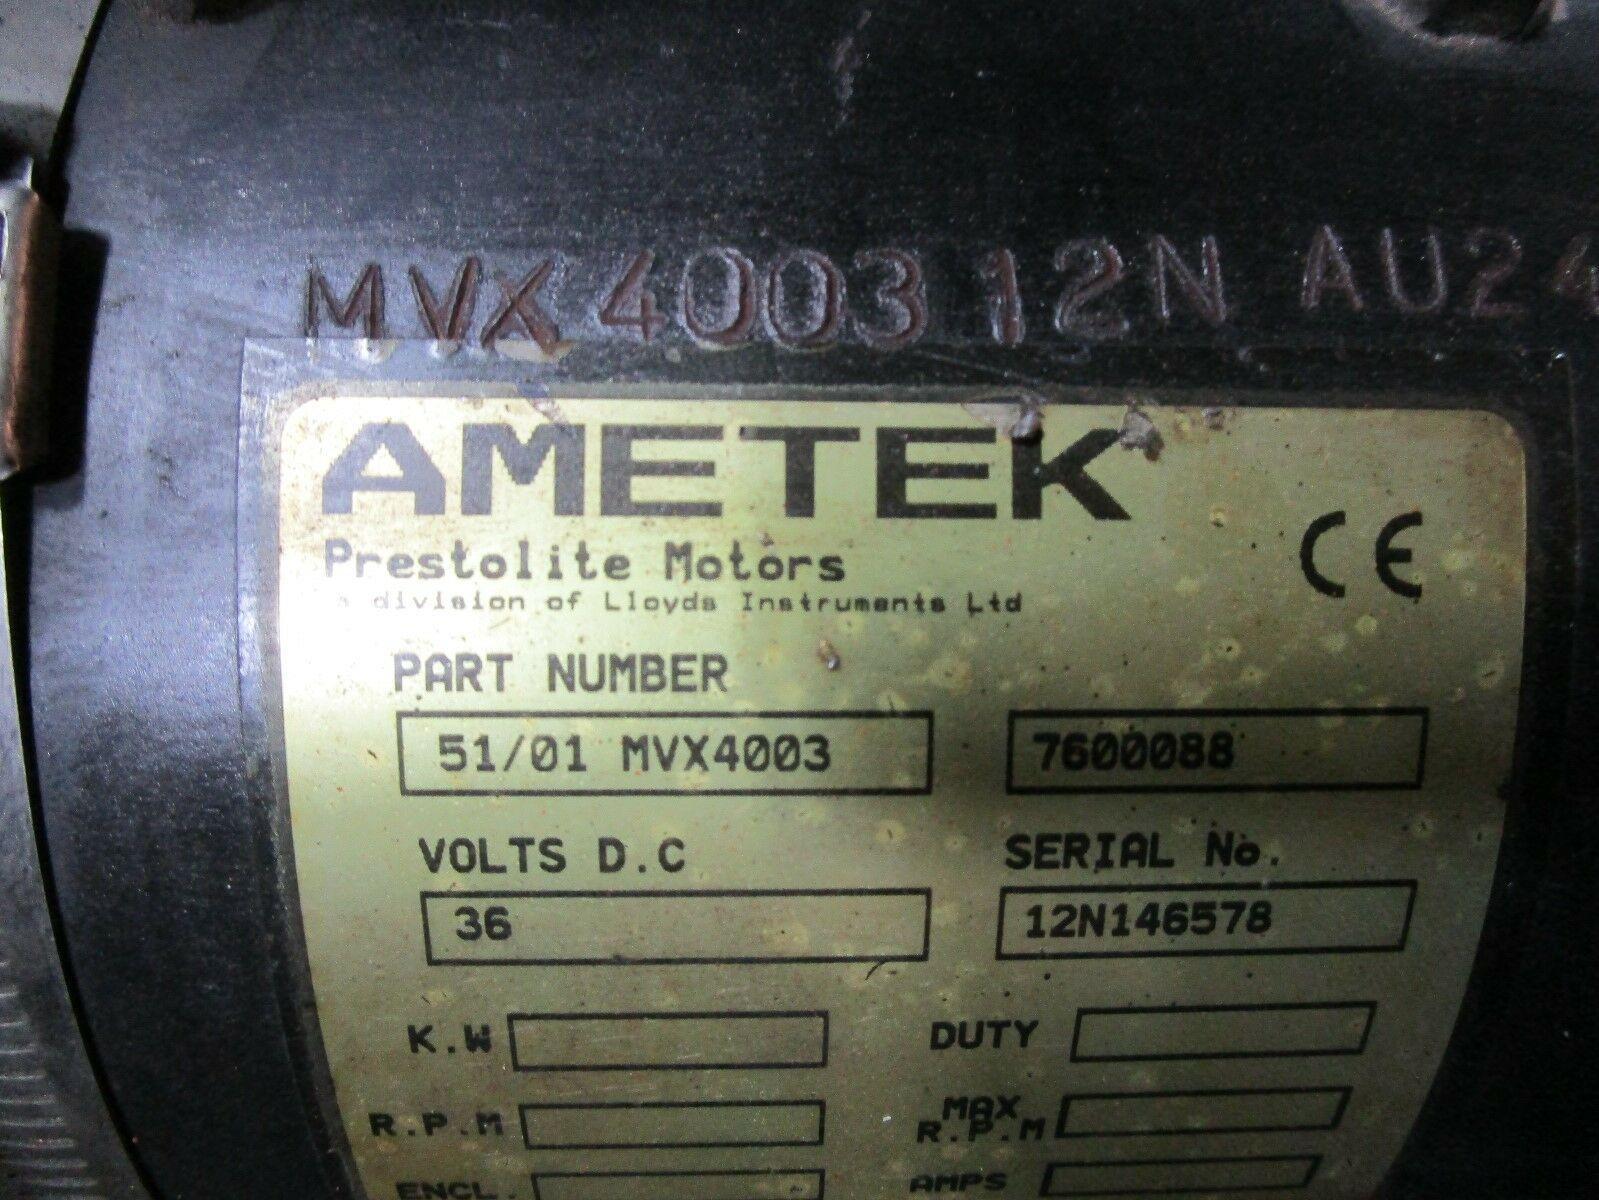 Toyota Fork Lift Drive Motor and Gear Box Ametek Prestolite MVX400 36V (Left)